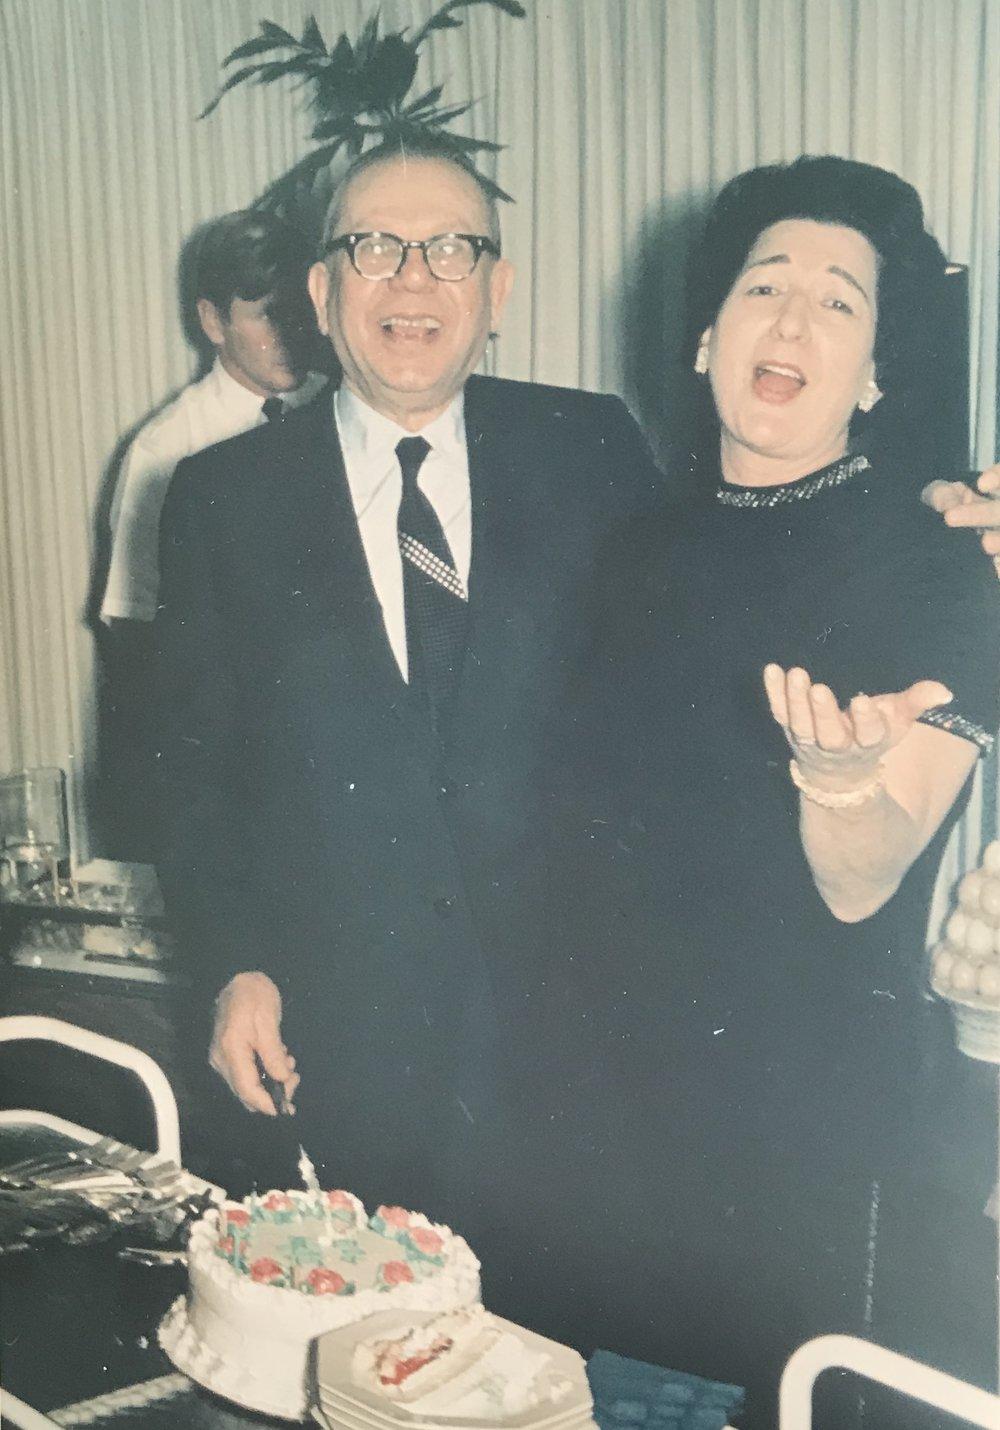 Evelyn & Saul Reinfeld celebrating their 40th wedding anniversary, 1968.